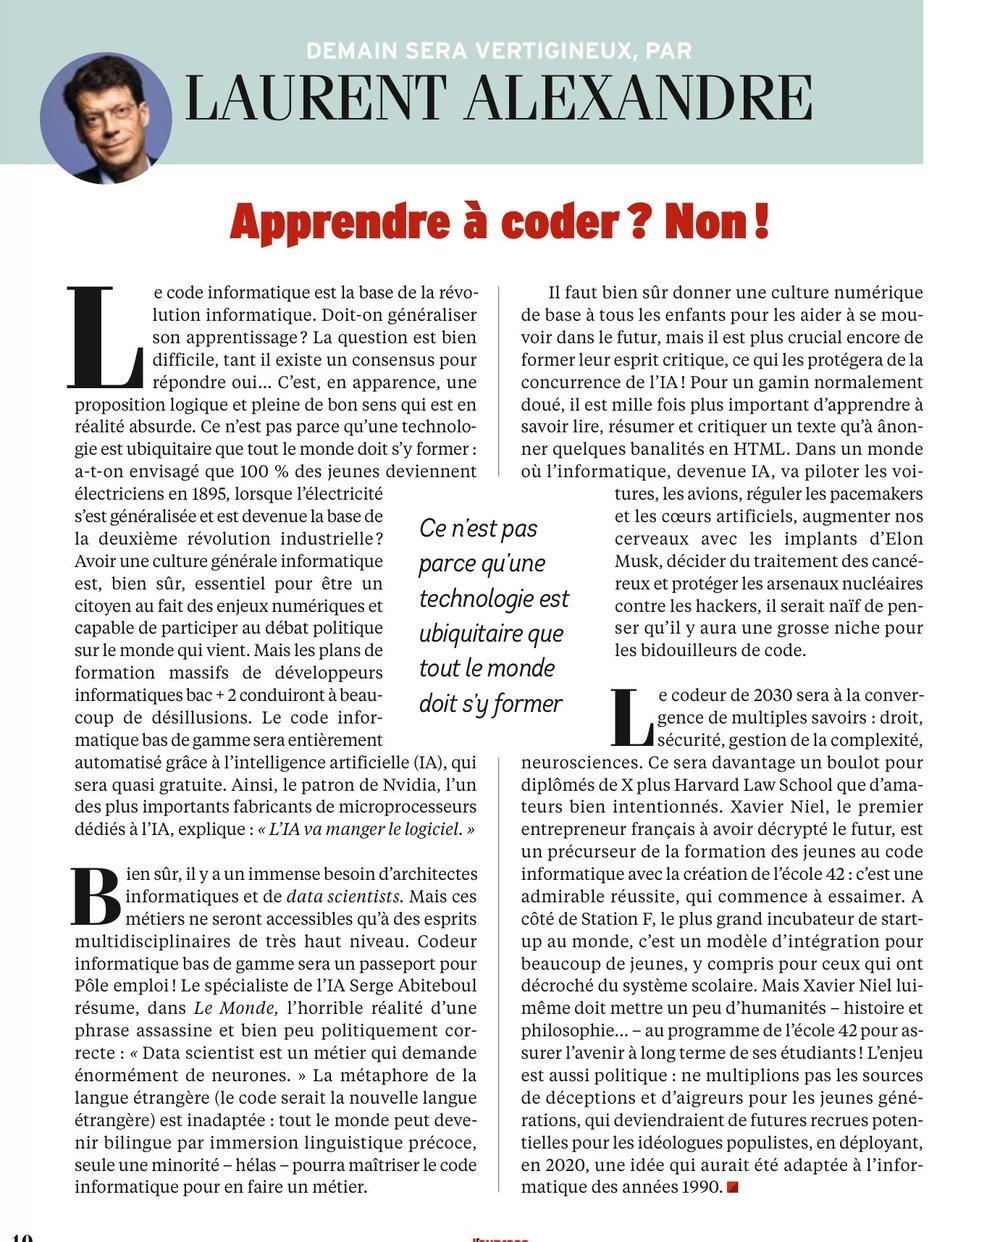 Laurent_alexandre_tous_codeurs.jpg